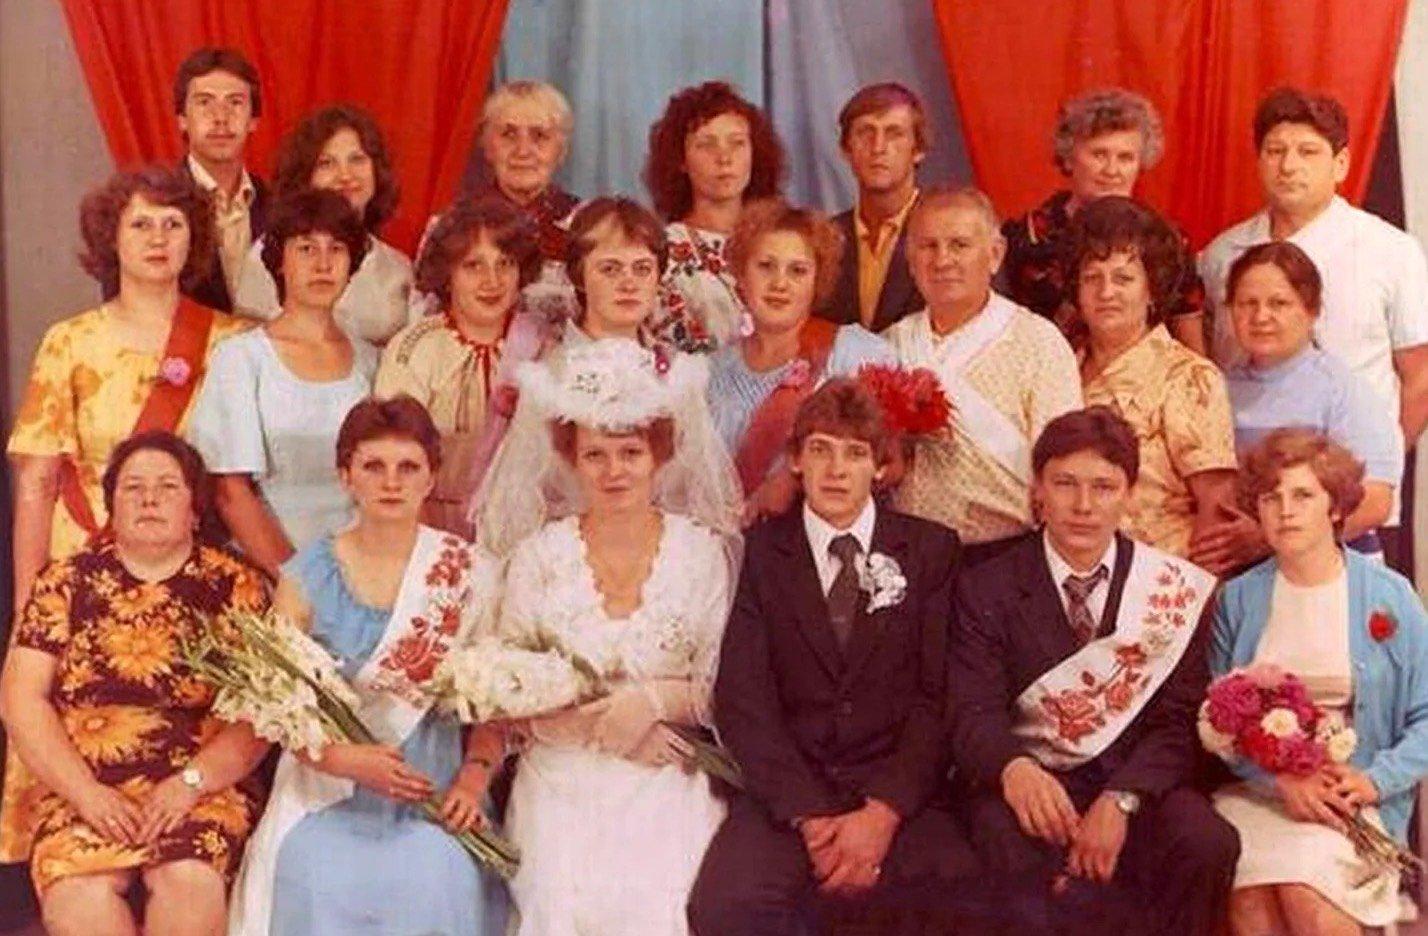 Свадьбы 80-х годов: мода по талонам и хенд-мейд